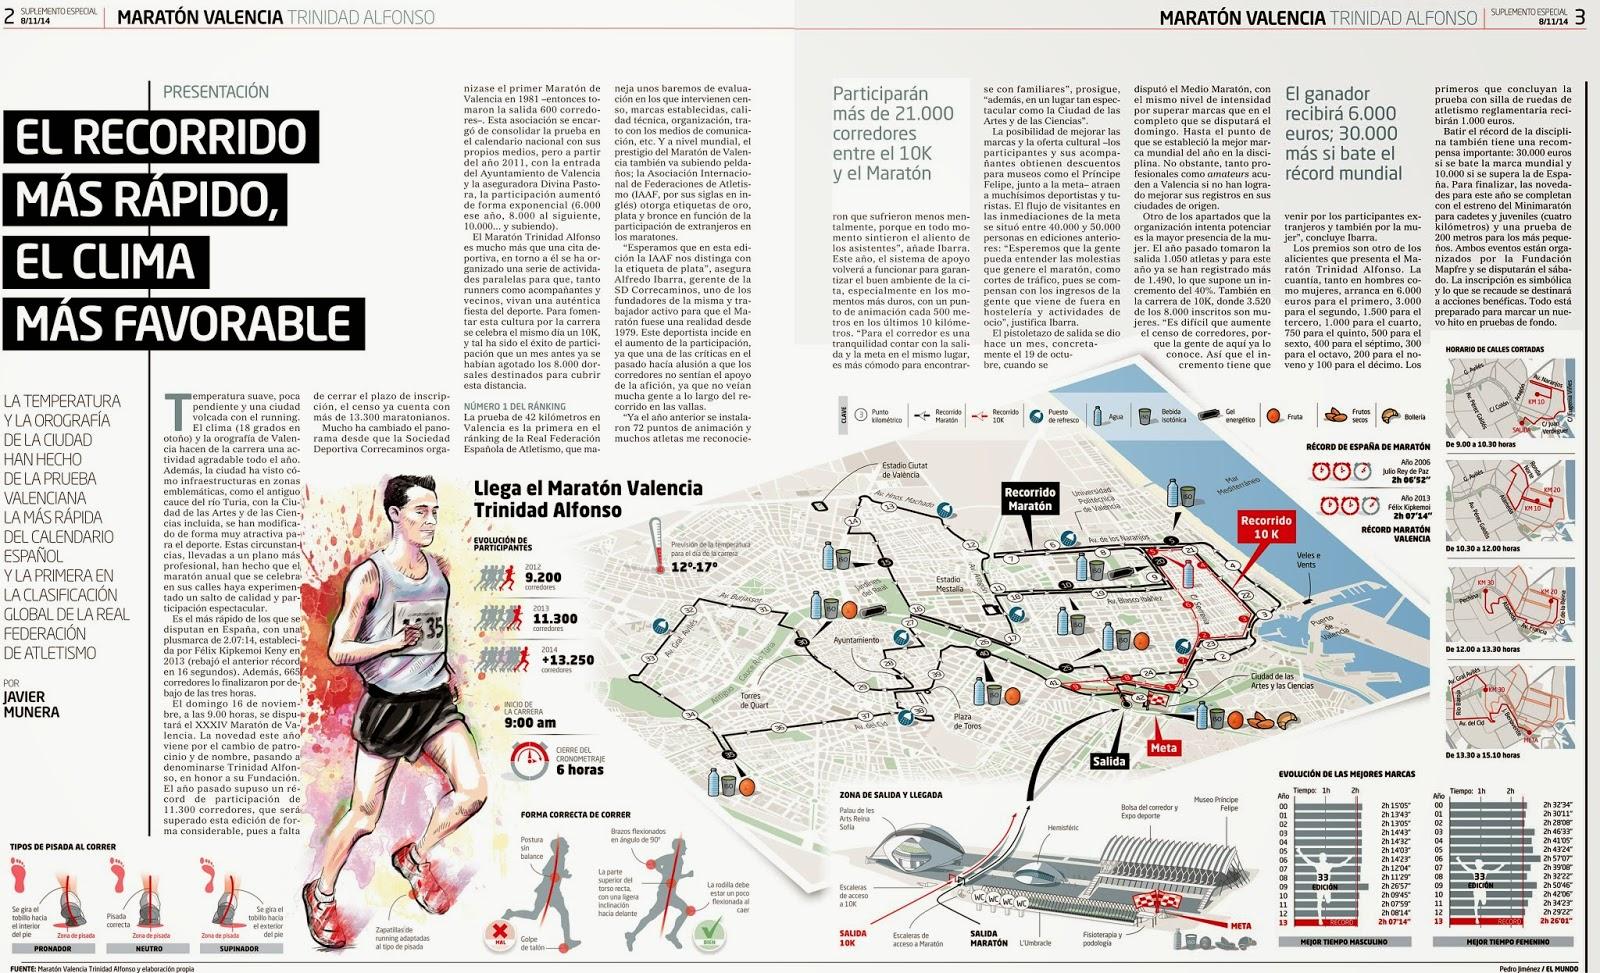 34 maraton valencia trinidad alfonso 2014